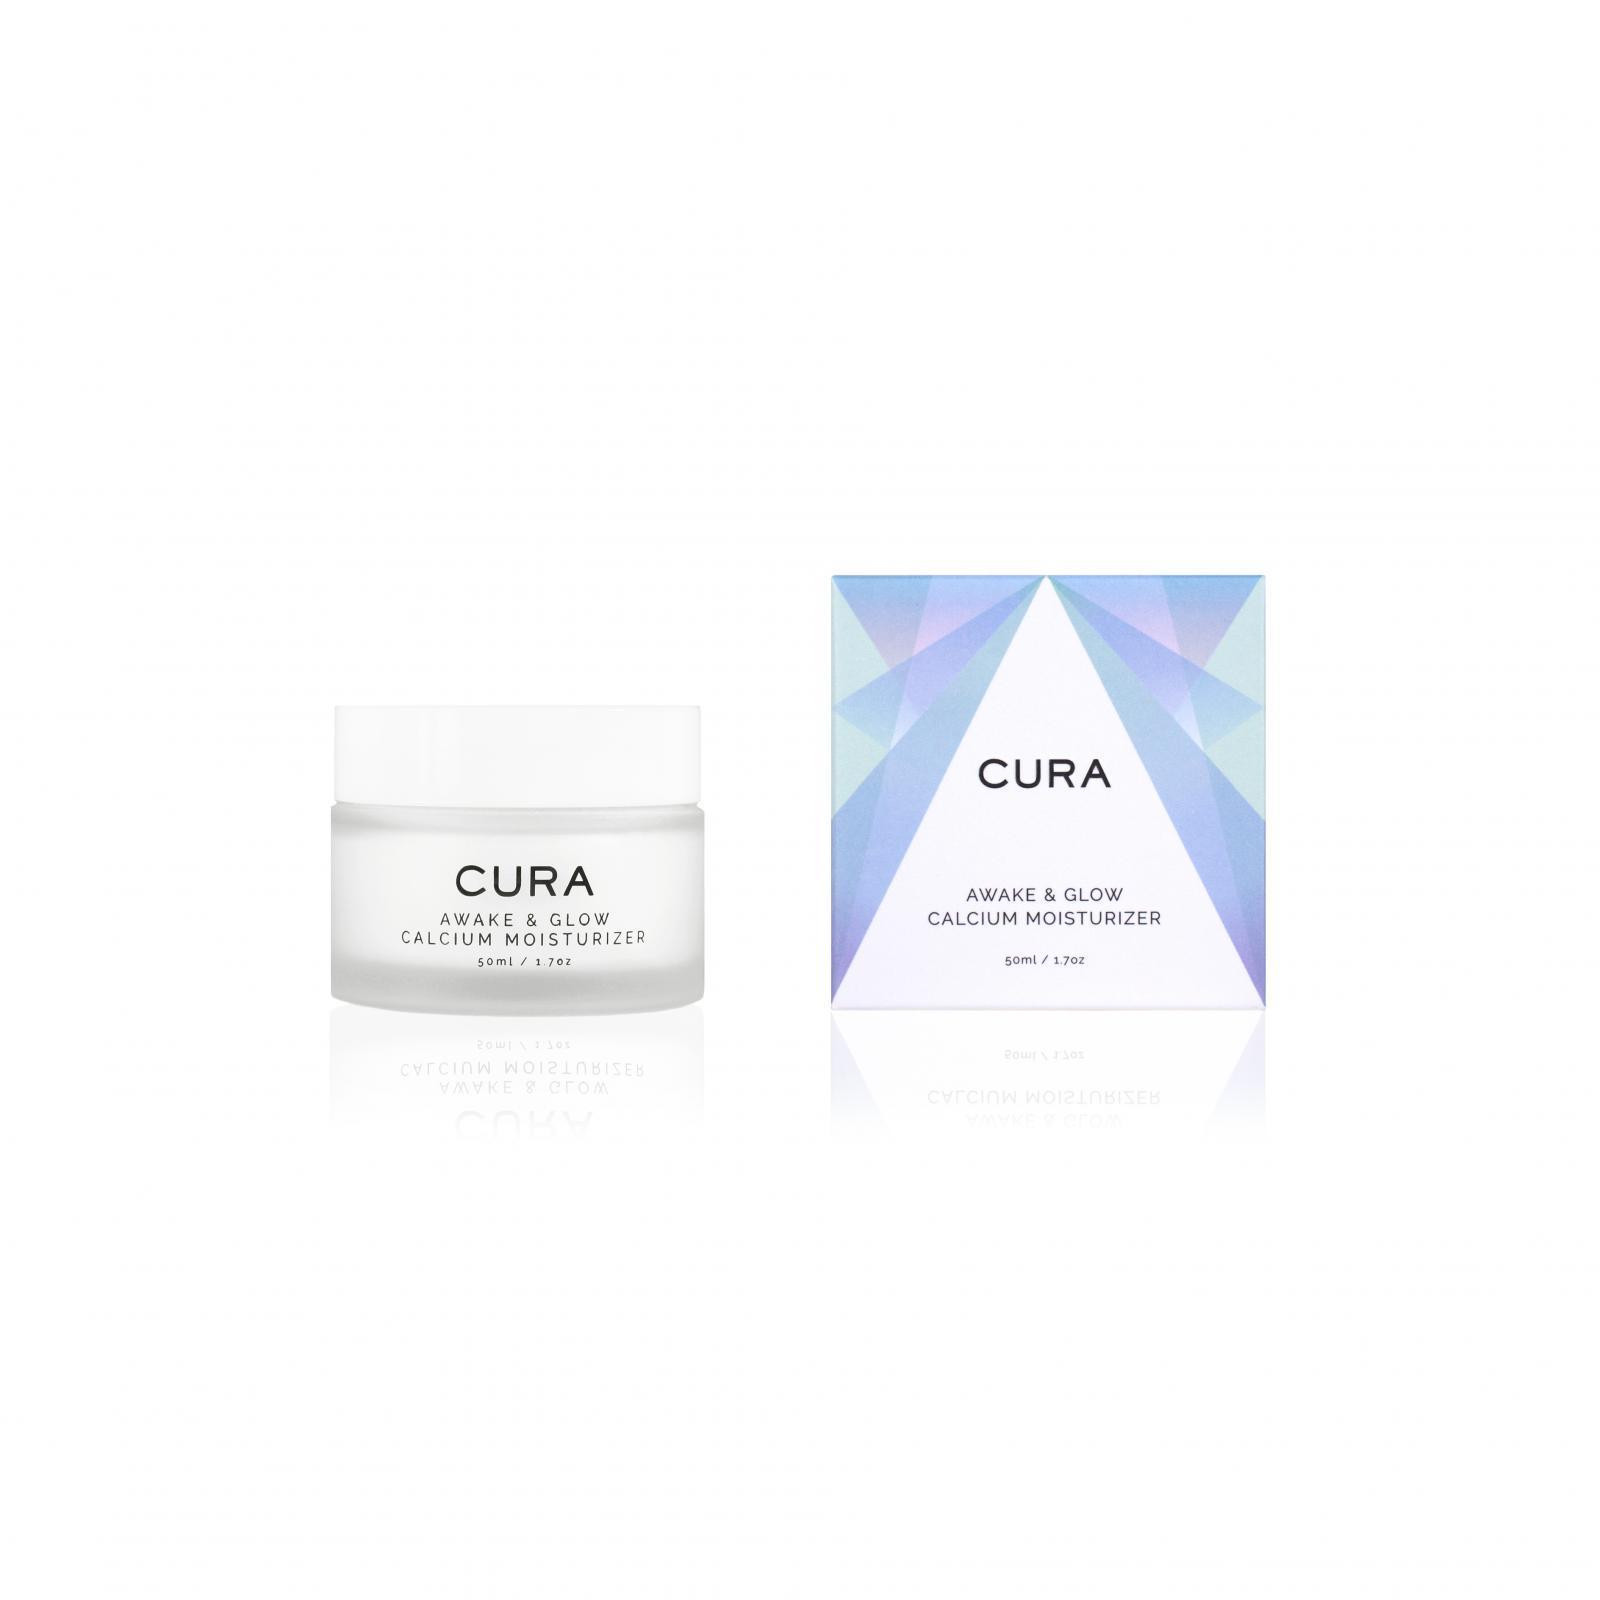 Awake & Glow Calcium Moisturizer